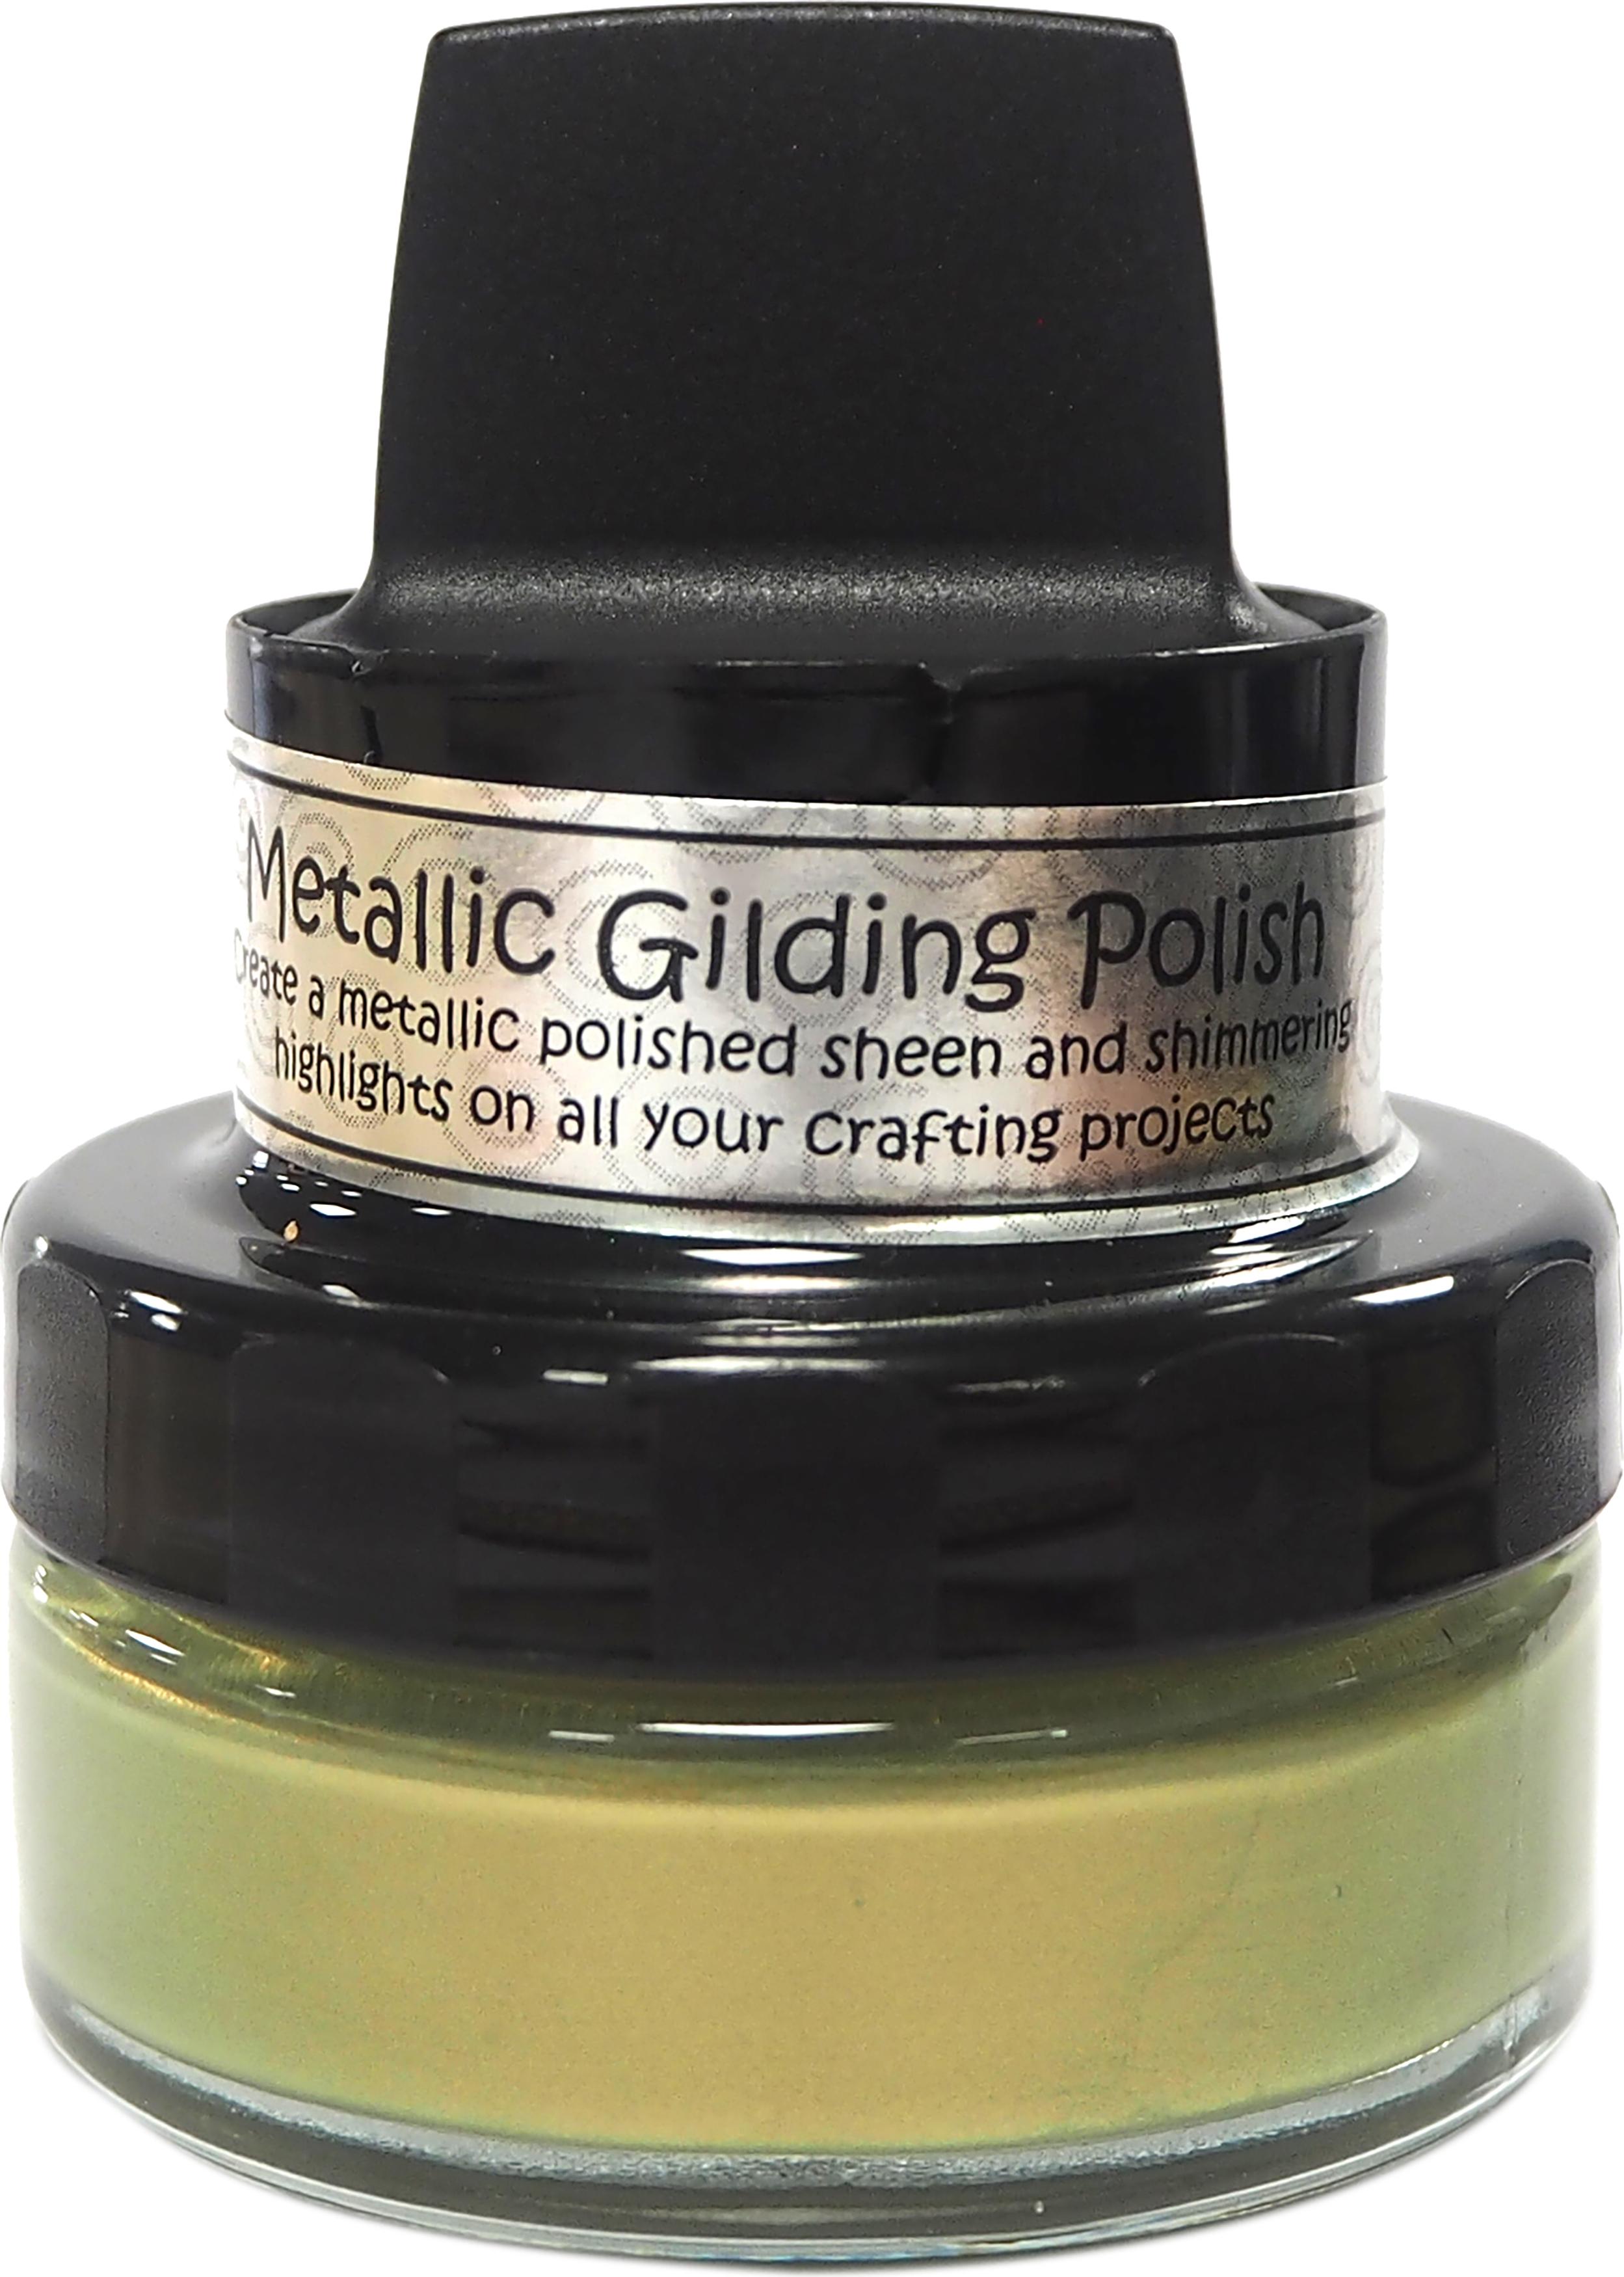 Cosmic Shimmer Metallic Gilding Polish Golden Olive